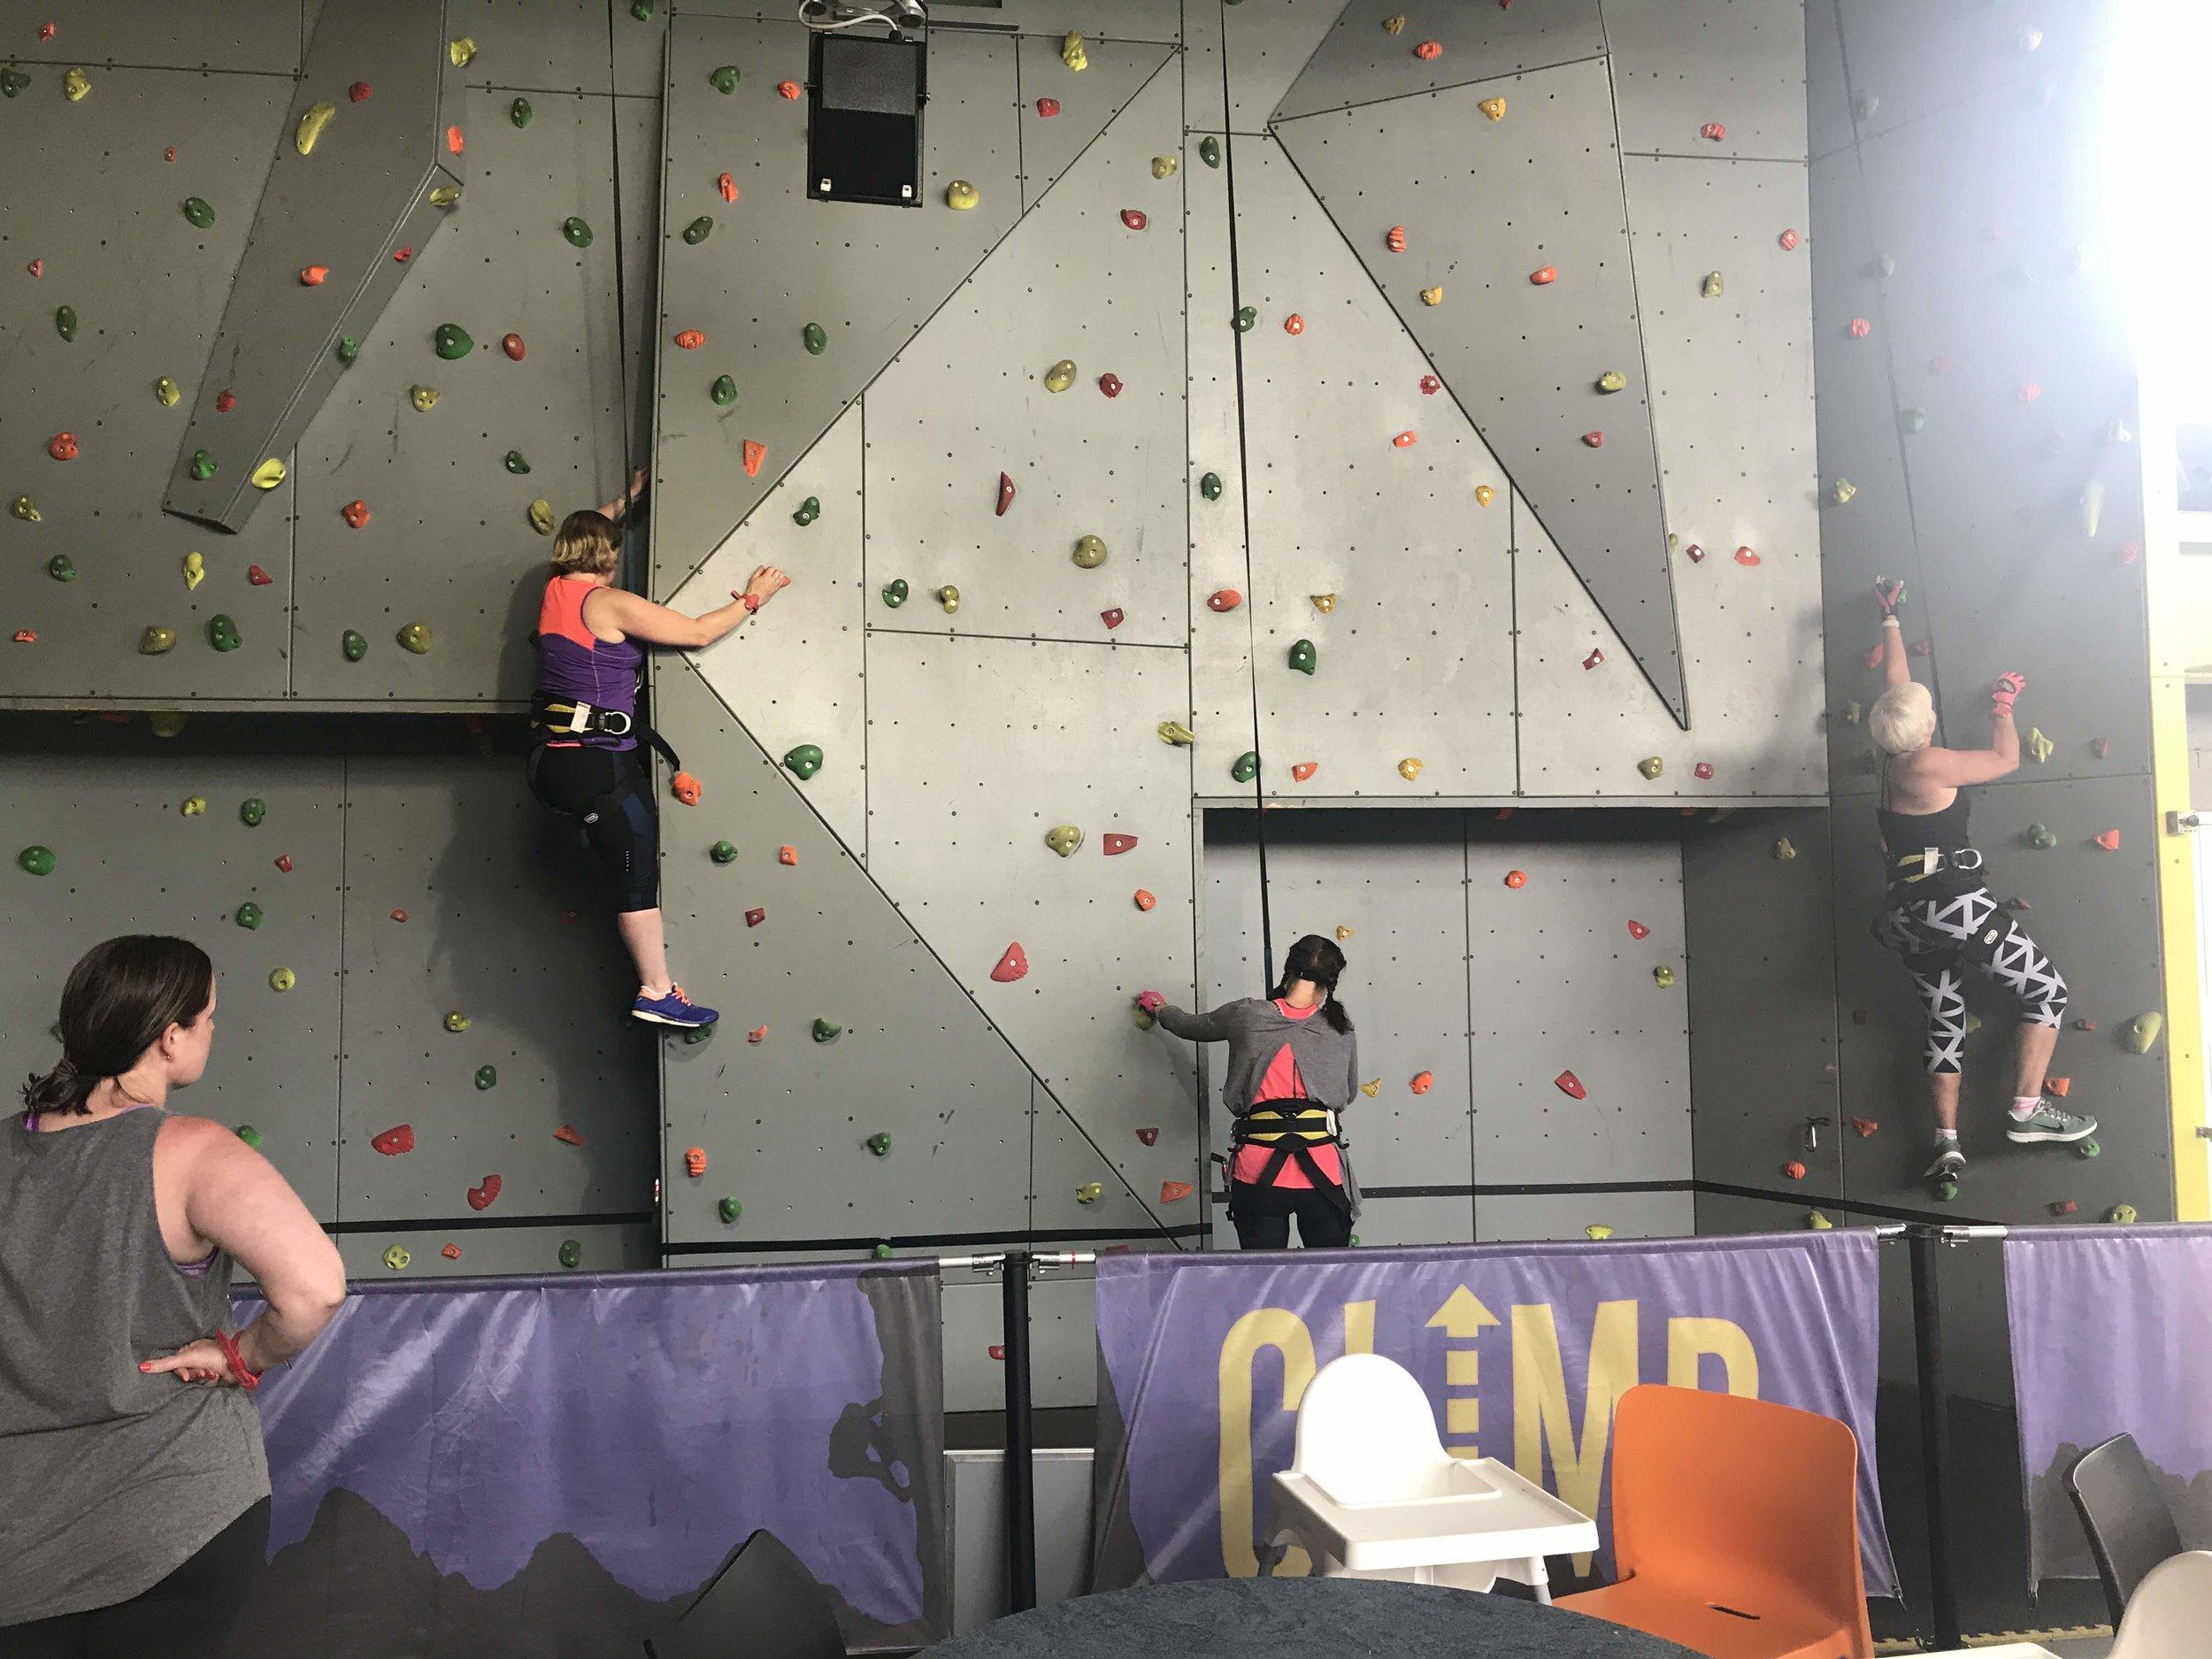 Wall climbing at twinwoods